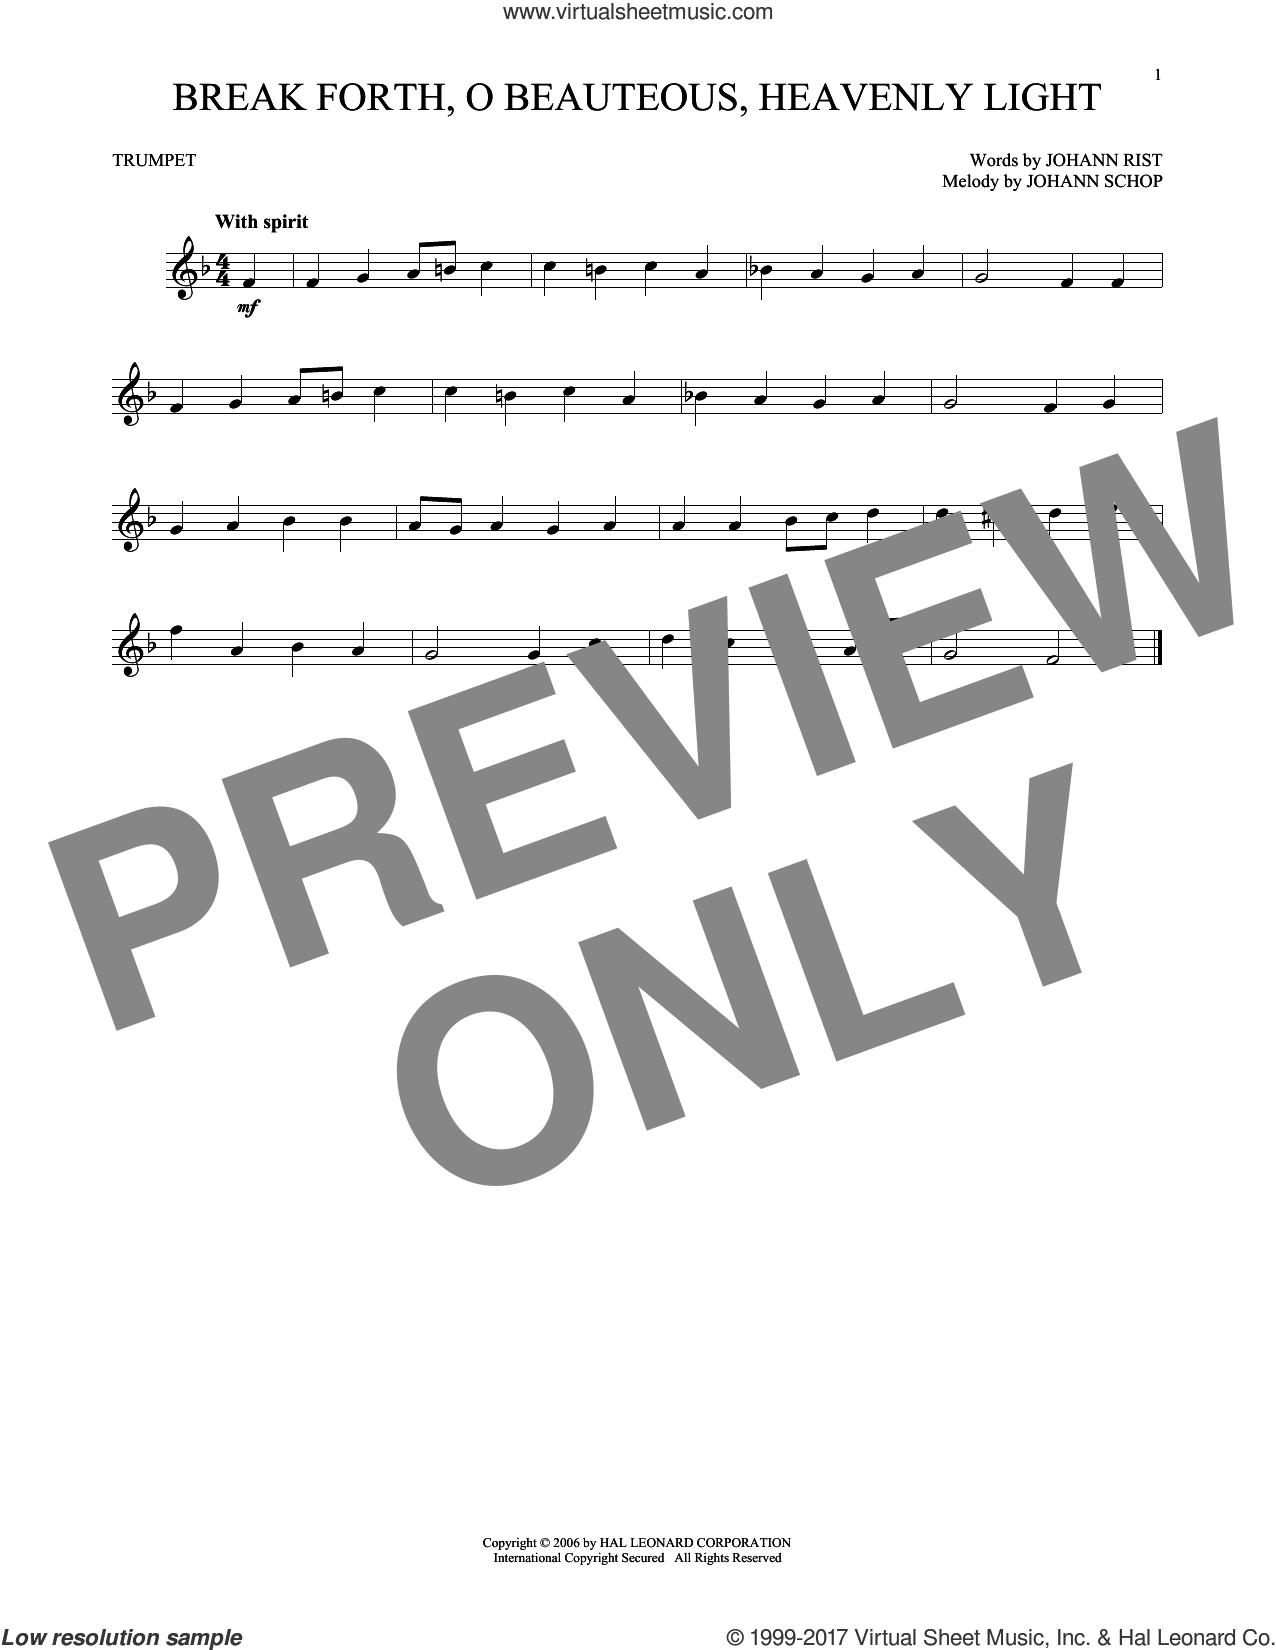 Break Forth, O Beauteous, Heavenly Light sheet music for trumpet solo by Johann Sebastian Bach, Johann Rist, Johann Schop and John Troutbeck (trans.), classical score, intermediate skill level